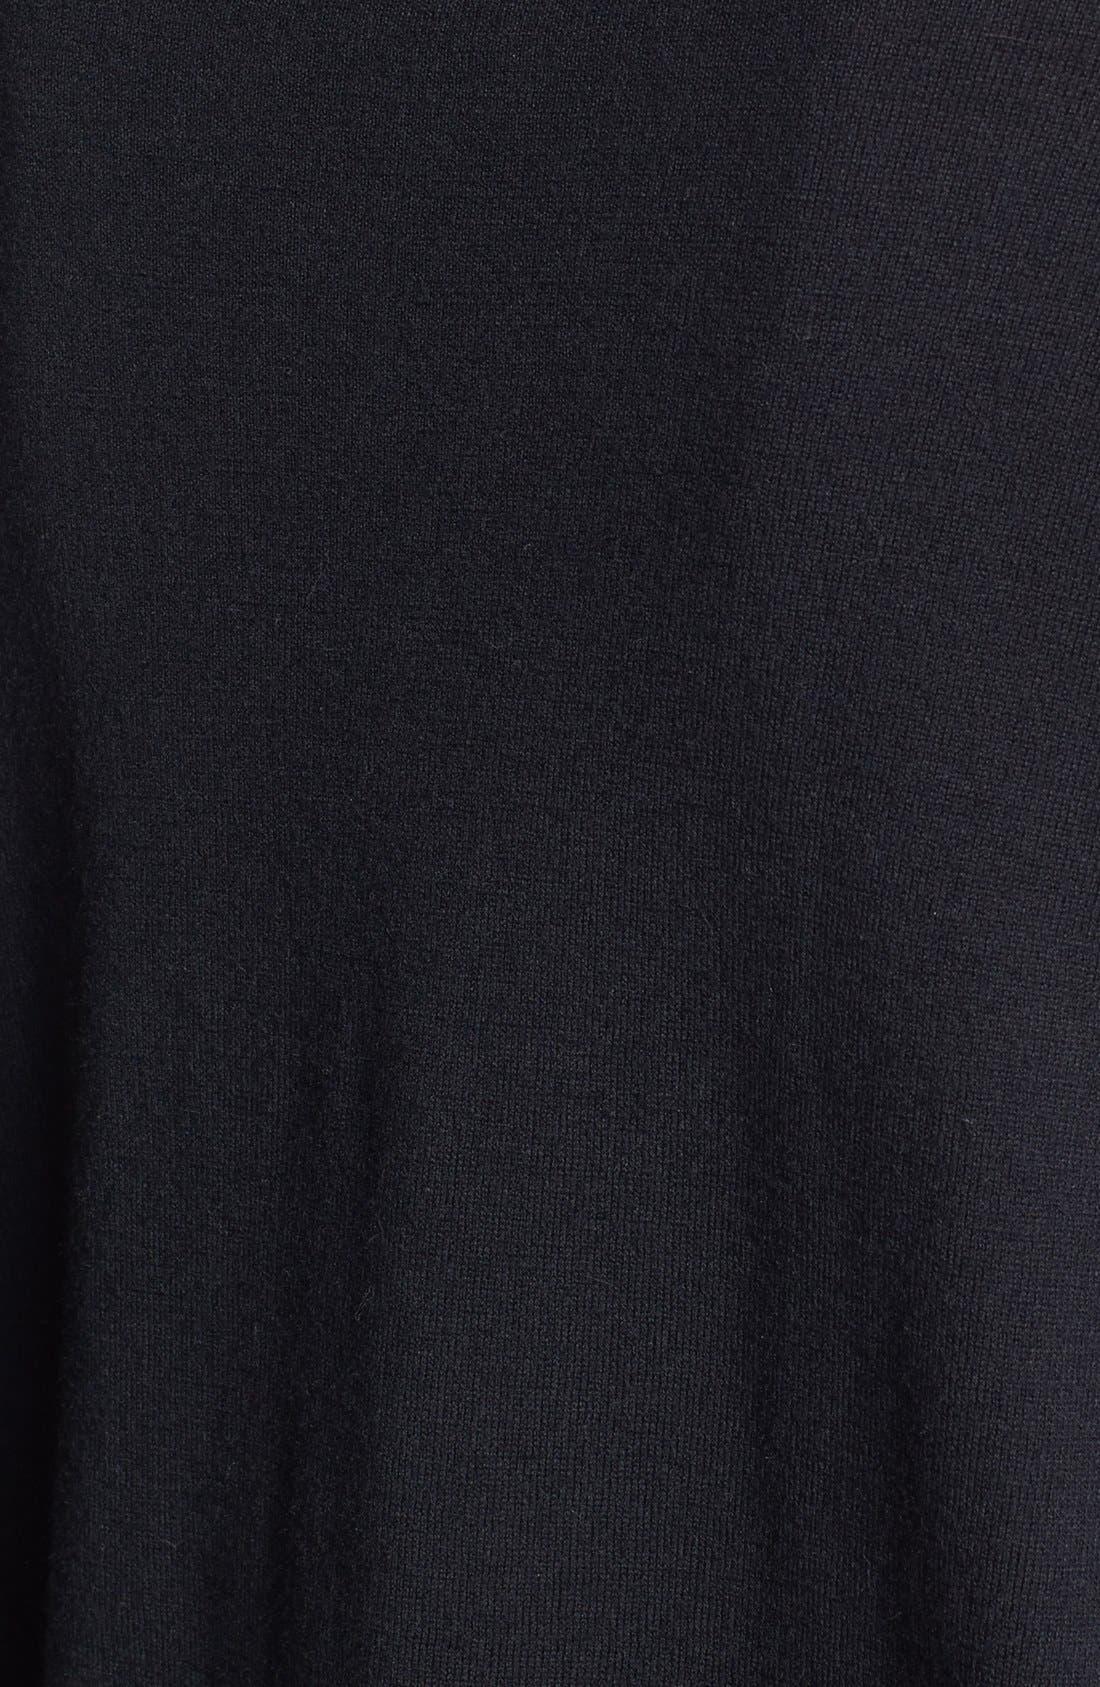 Alternate Image 3  - Joie 'Malena B.' Mixed Media Sweater